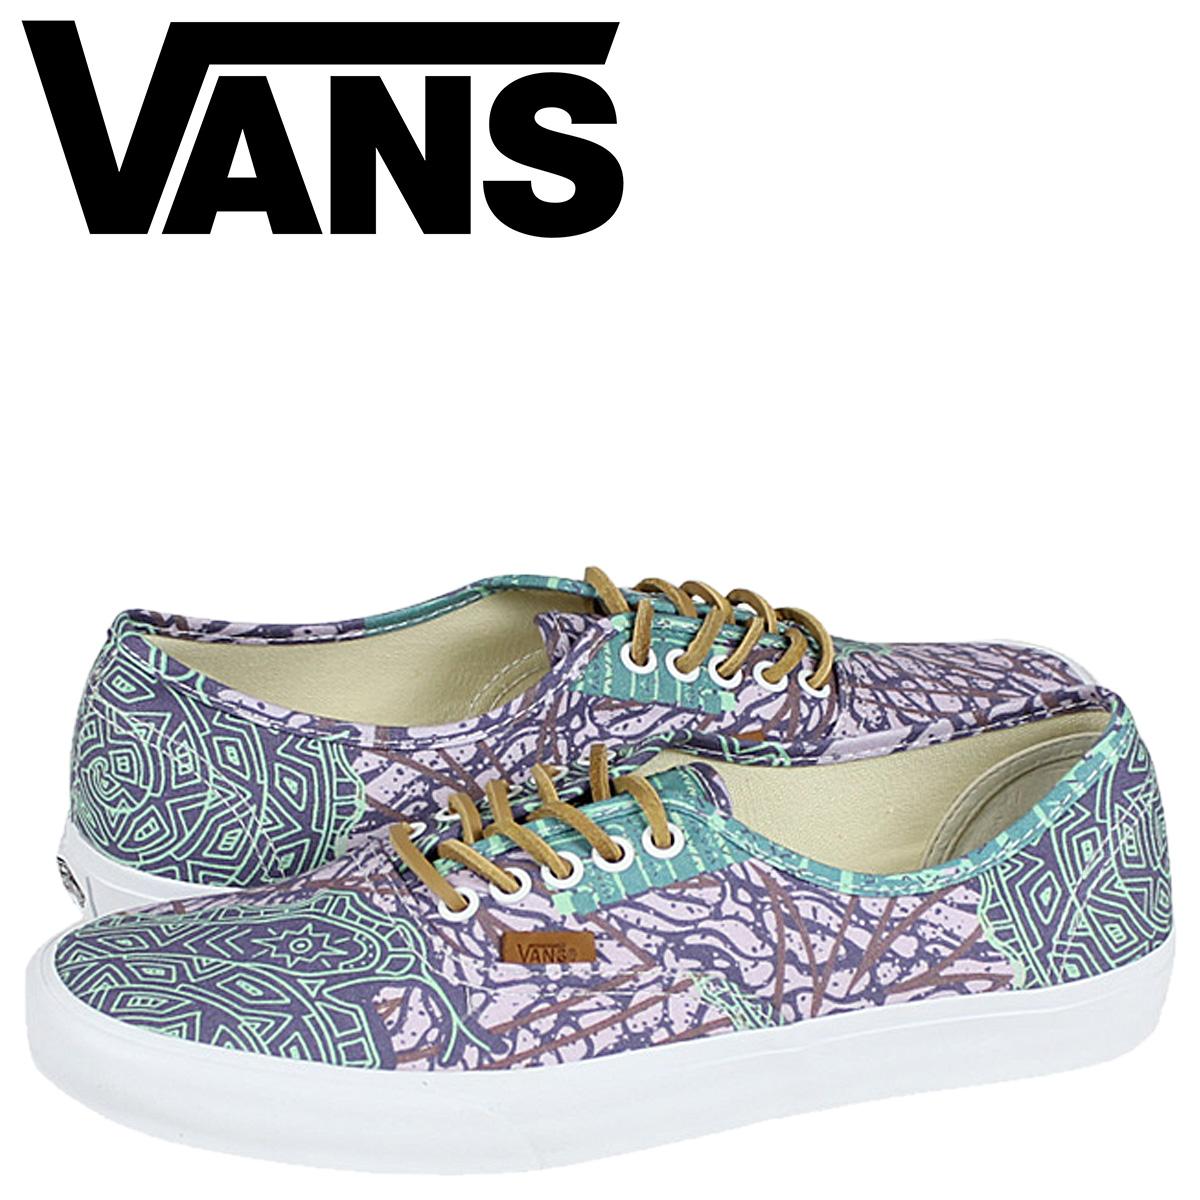 VANS vans authentic sneakers AUTHENTIC CA CALI TRIBE WASHED HELIO VN 0JWIAS3 men shoes blue